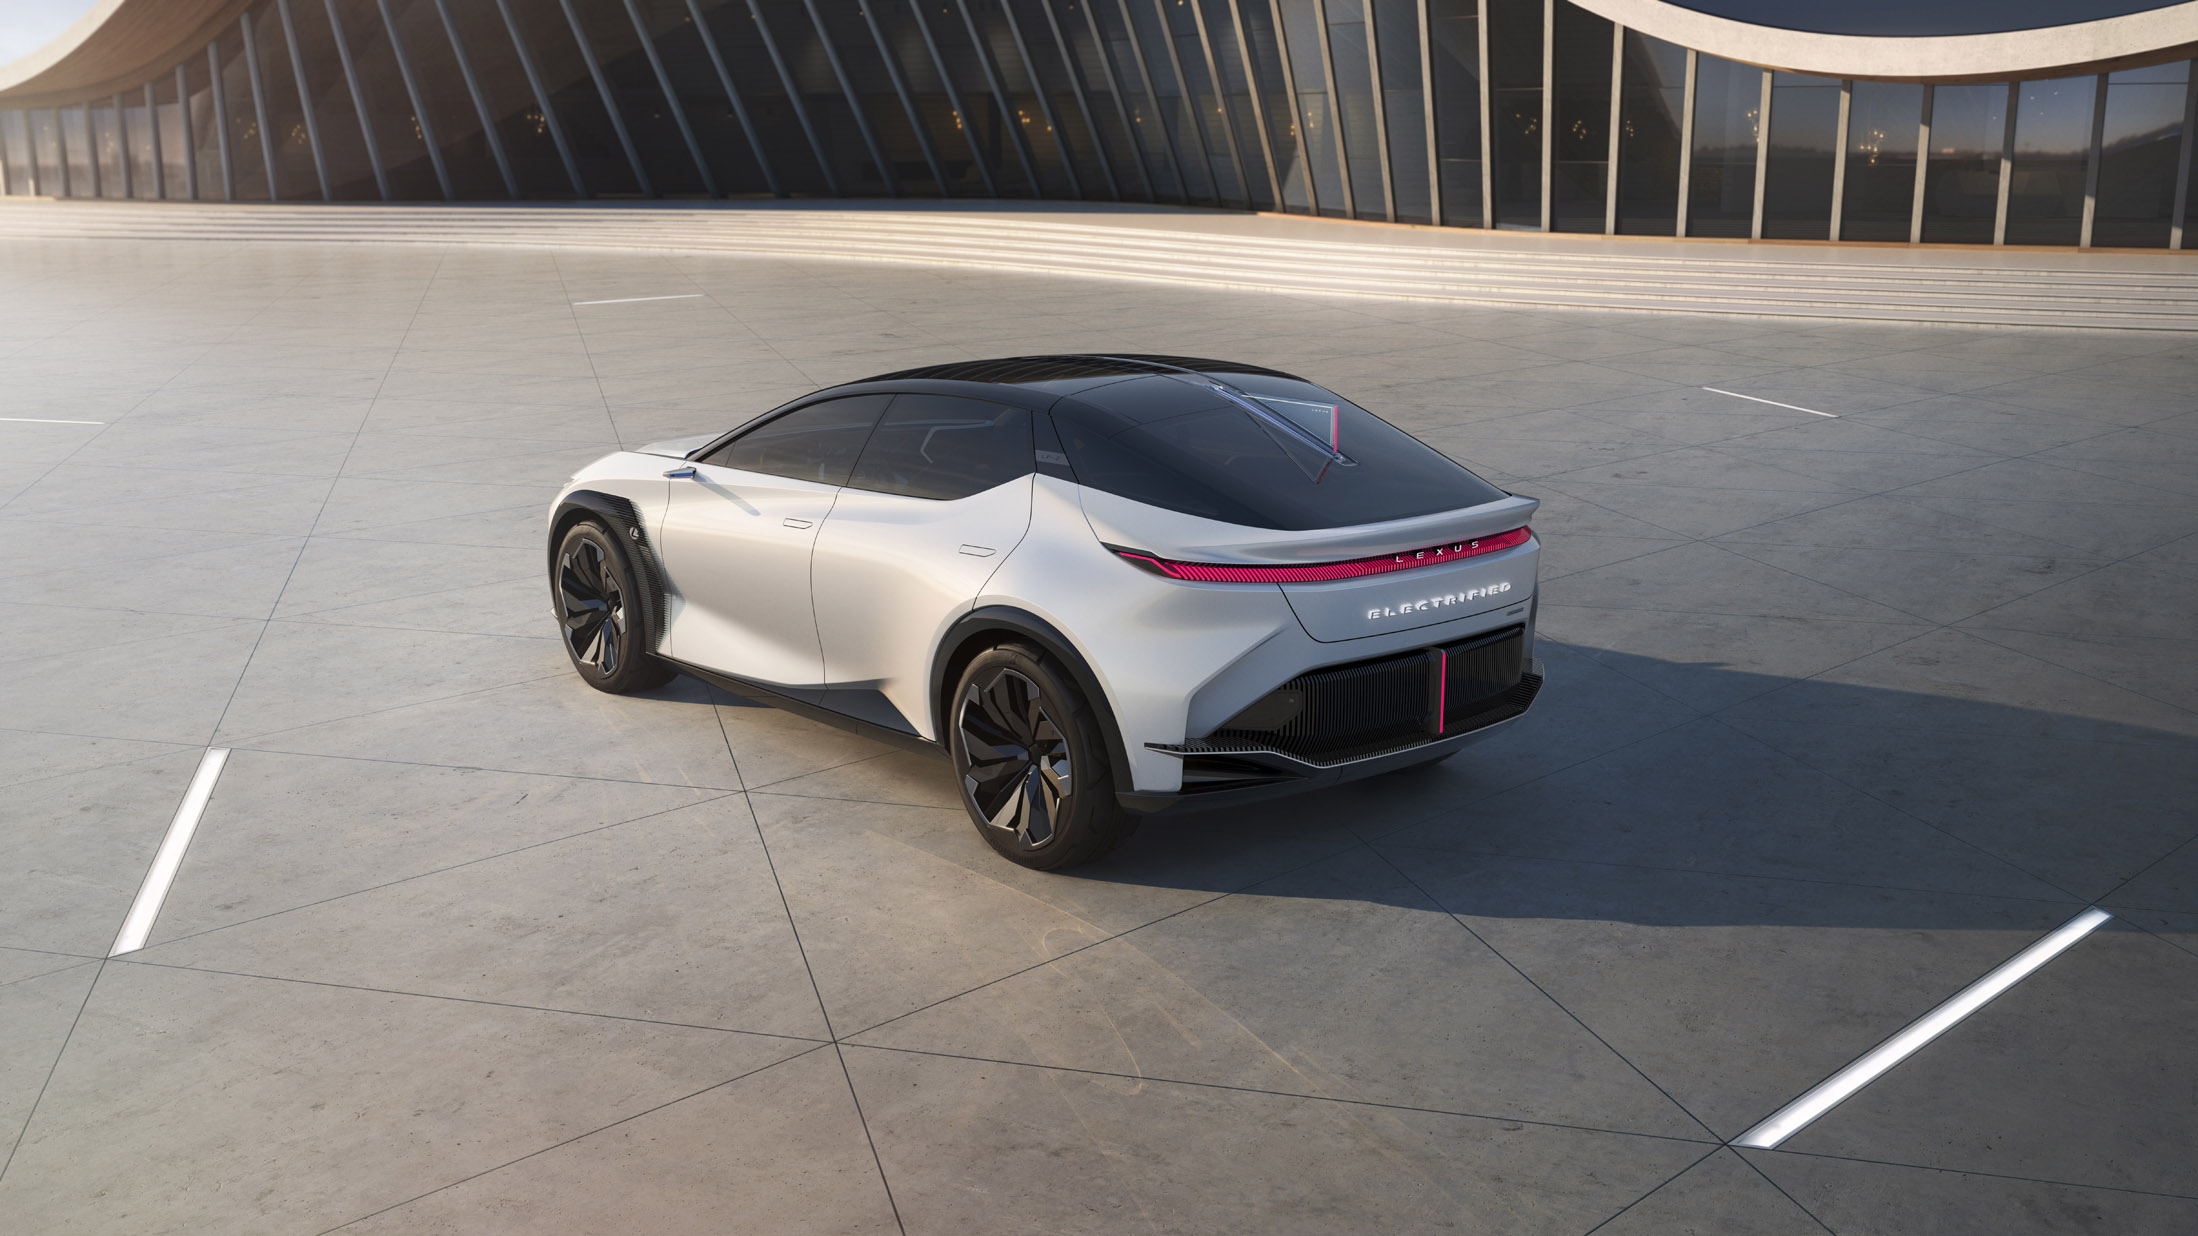 02-Lexus-LF-Z-Electrified